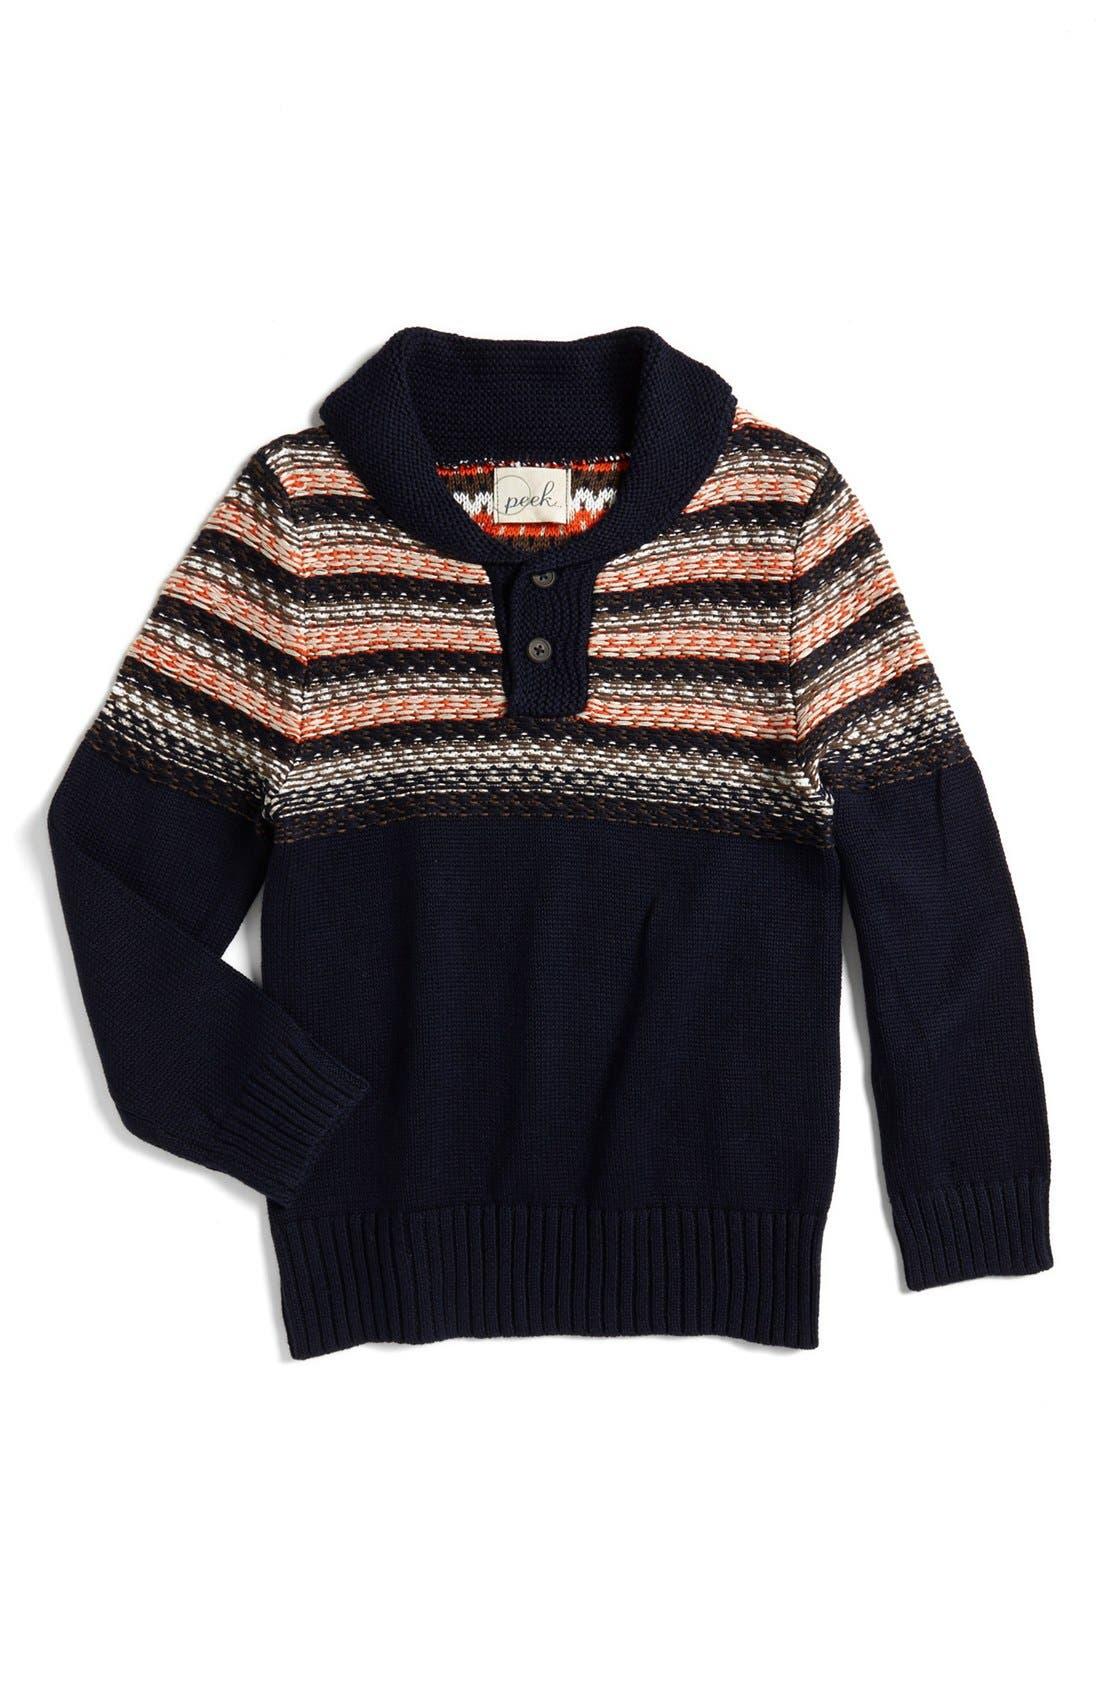 Alternate Image 1 Selected - Peek 'Grayson' Shawl Collar Sweater (Big Boys)